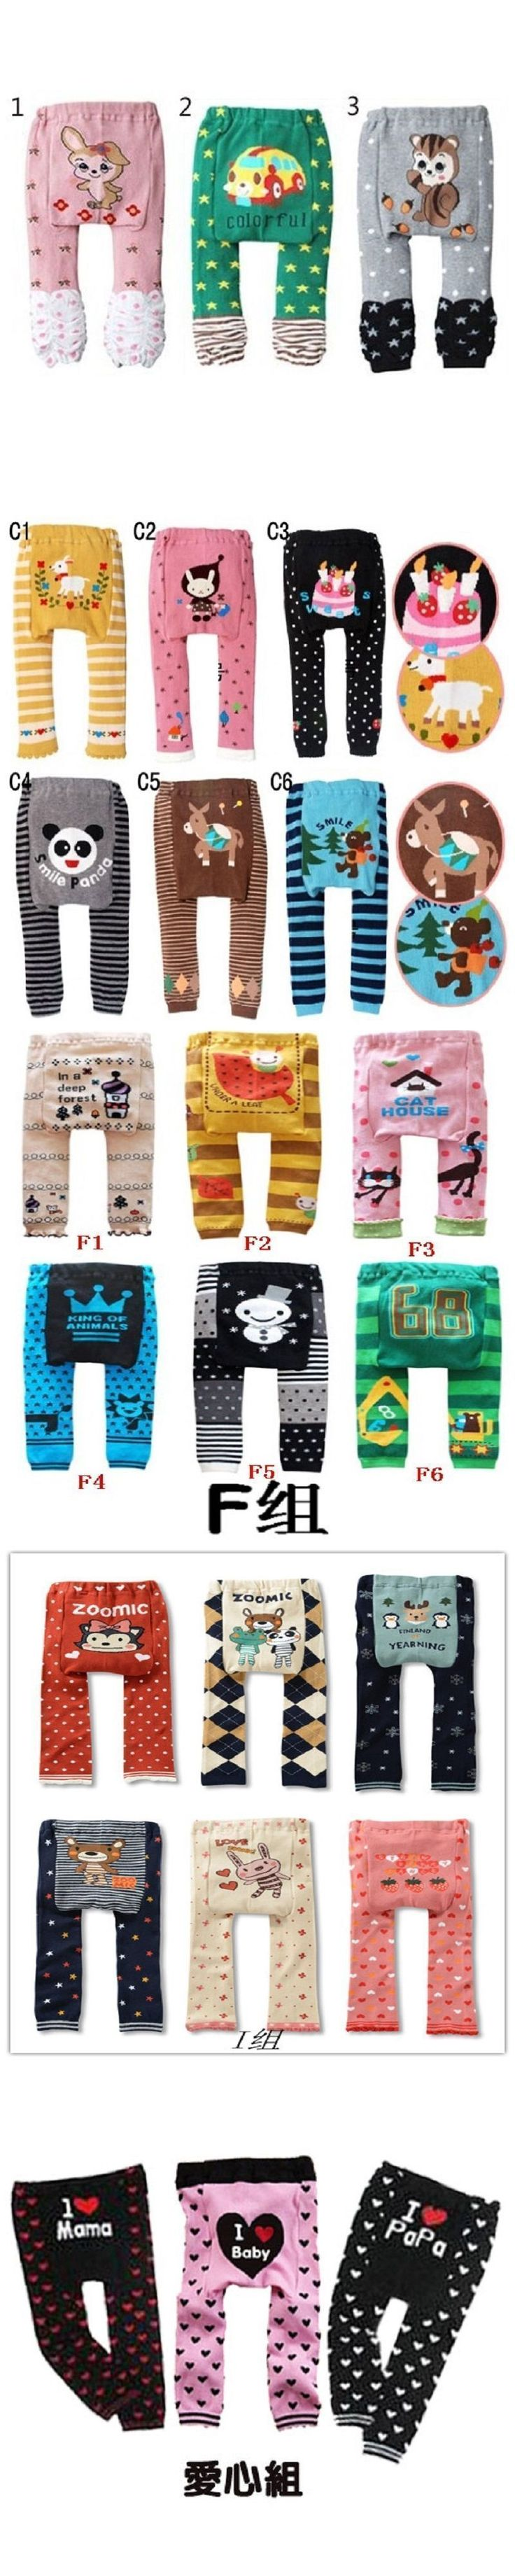 100% Cotton Baby Girls Pants Newborn Clothes Boys Pants Girl Leggings Infant Trousers legging for babies #babyboyleggings #babygirlleggings #babyleggings https://presentbaby.com